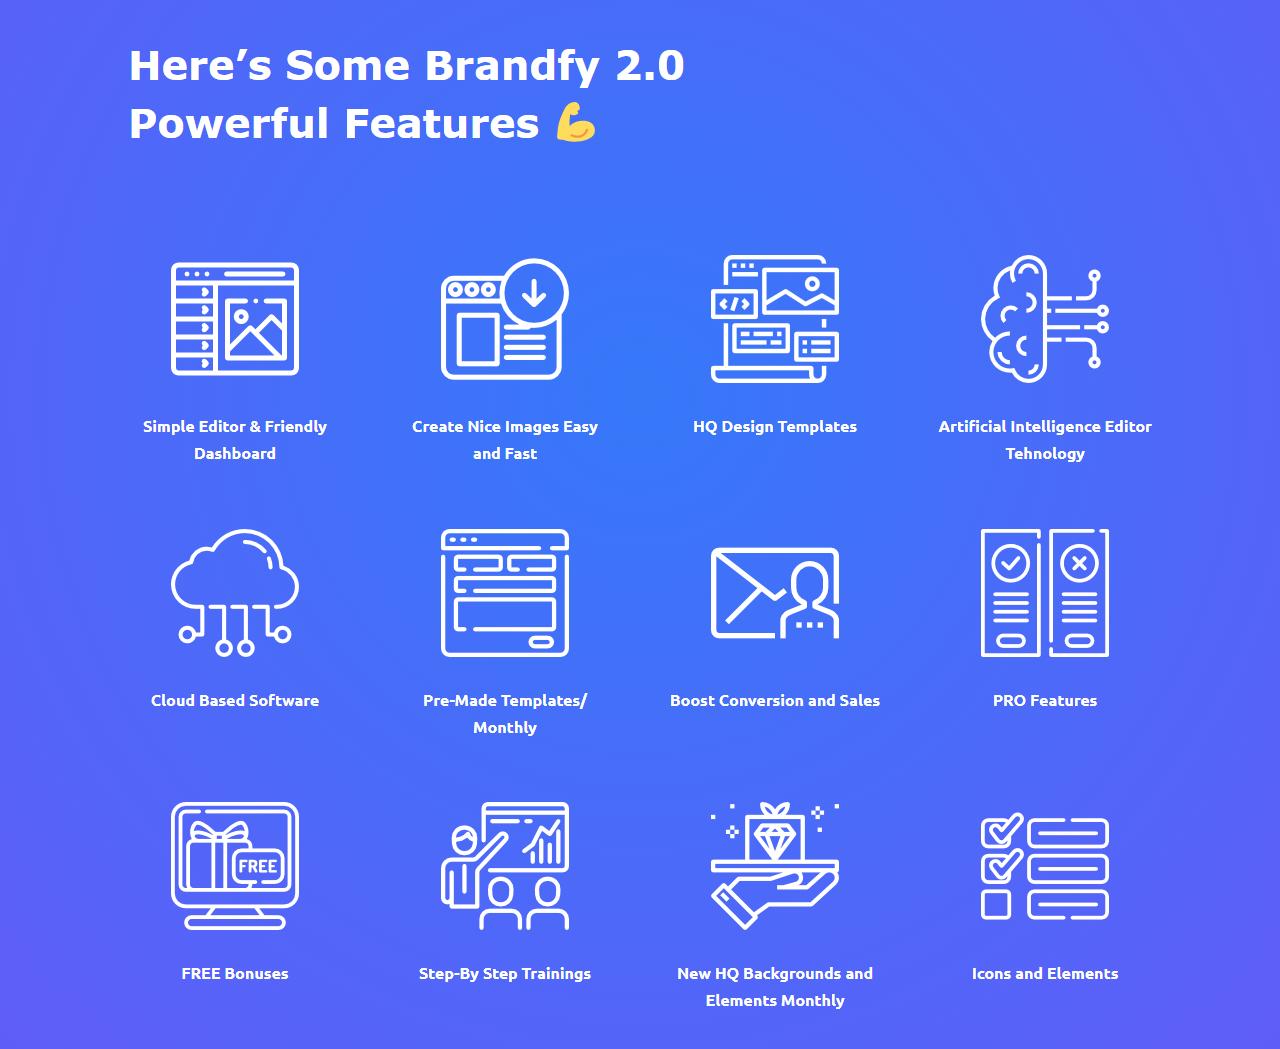 Brandfy 2.0 Review